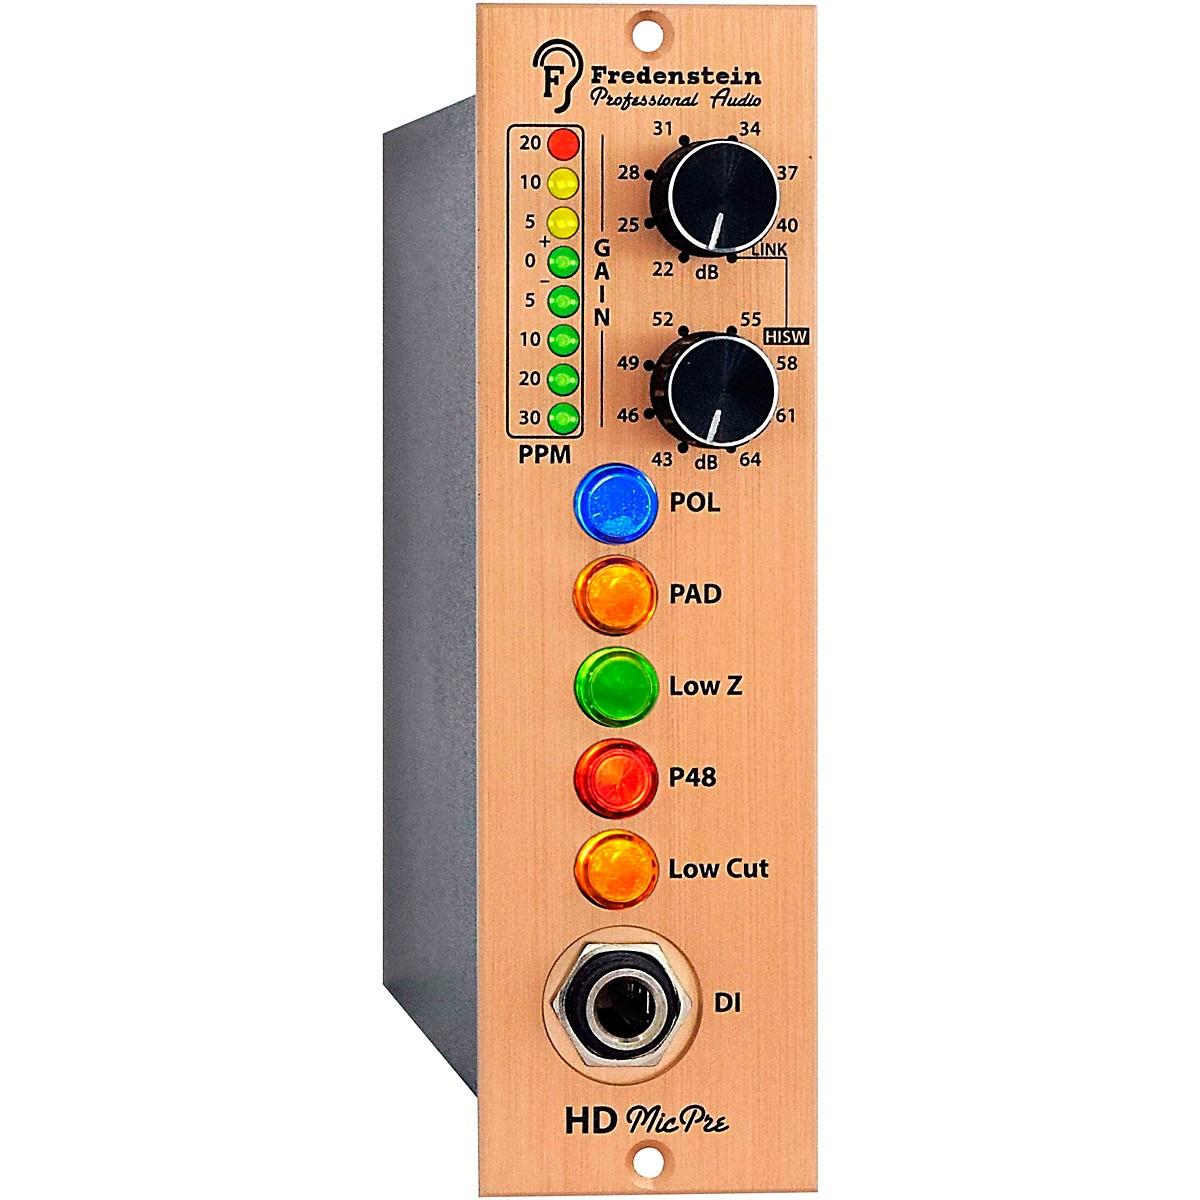 Fredenstein Professional Audio HD MicPre